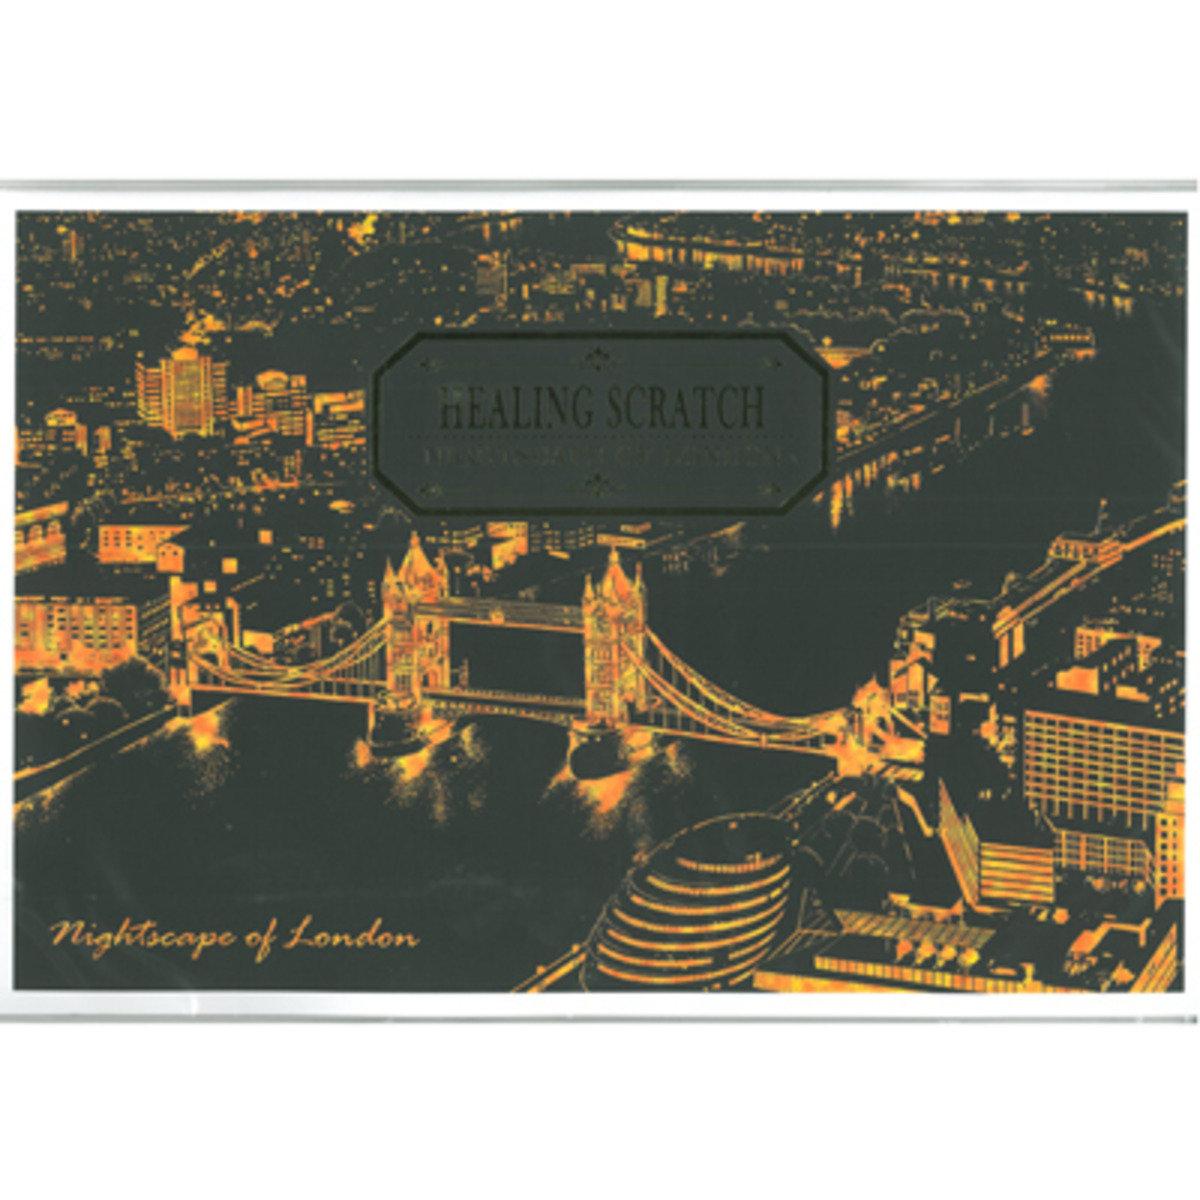 HEALING SCRATCH - NIGHTSCAPE OF LONDON 8809379160733